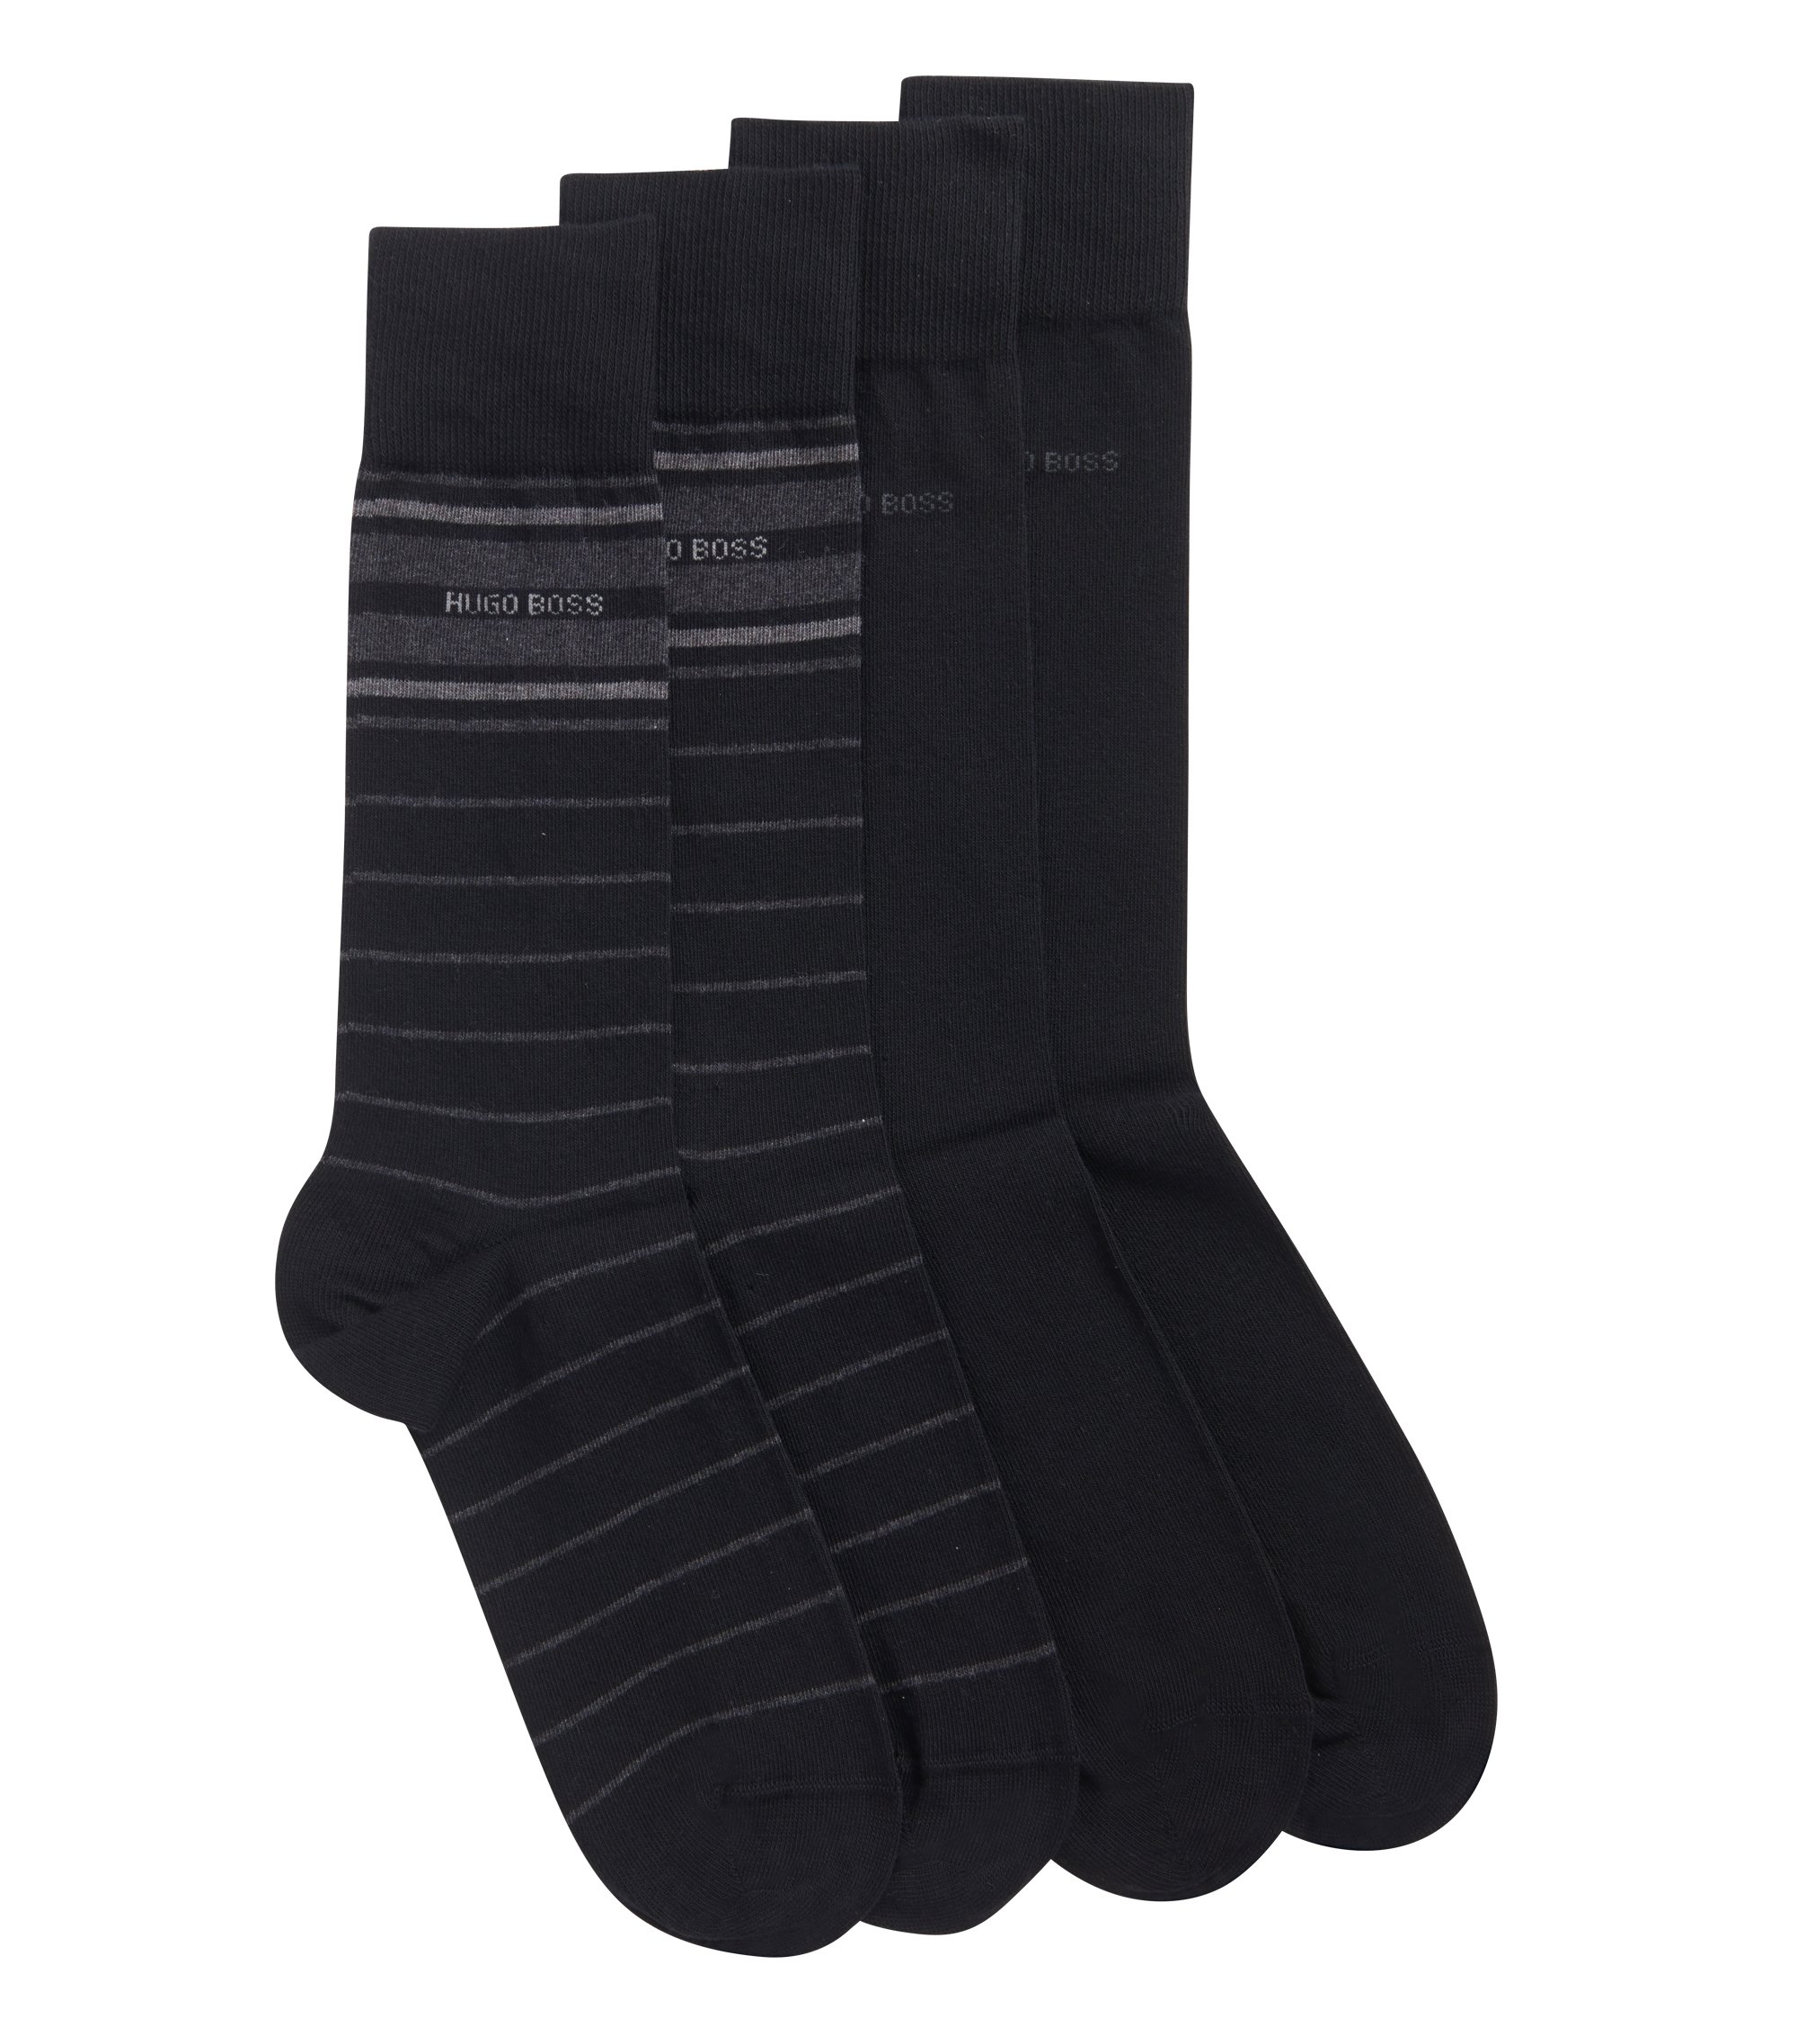 Stretch Cotton Socks, 2 Pack | 2P RS Stripe US CC, Black